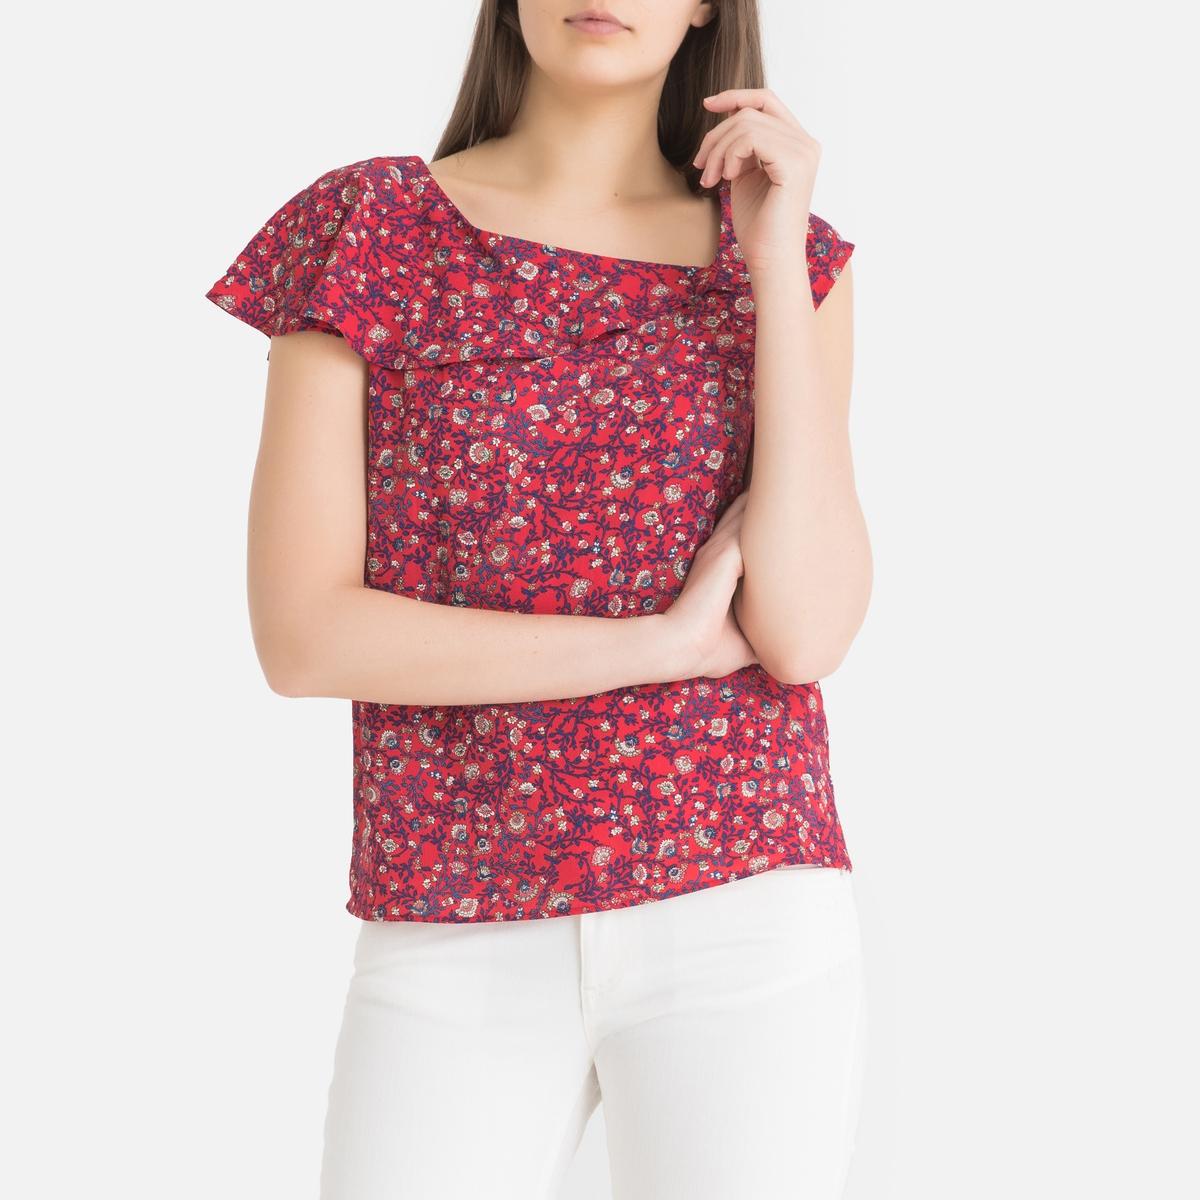 Блузка La Redoute С рисунком без рукавов 38 (FR) - 44 (RUS) розовый блузка la redoute с круглым вырезом без рукавов 50 fr 56 rus черный